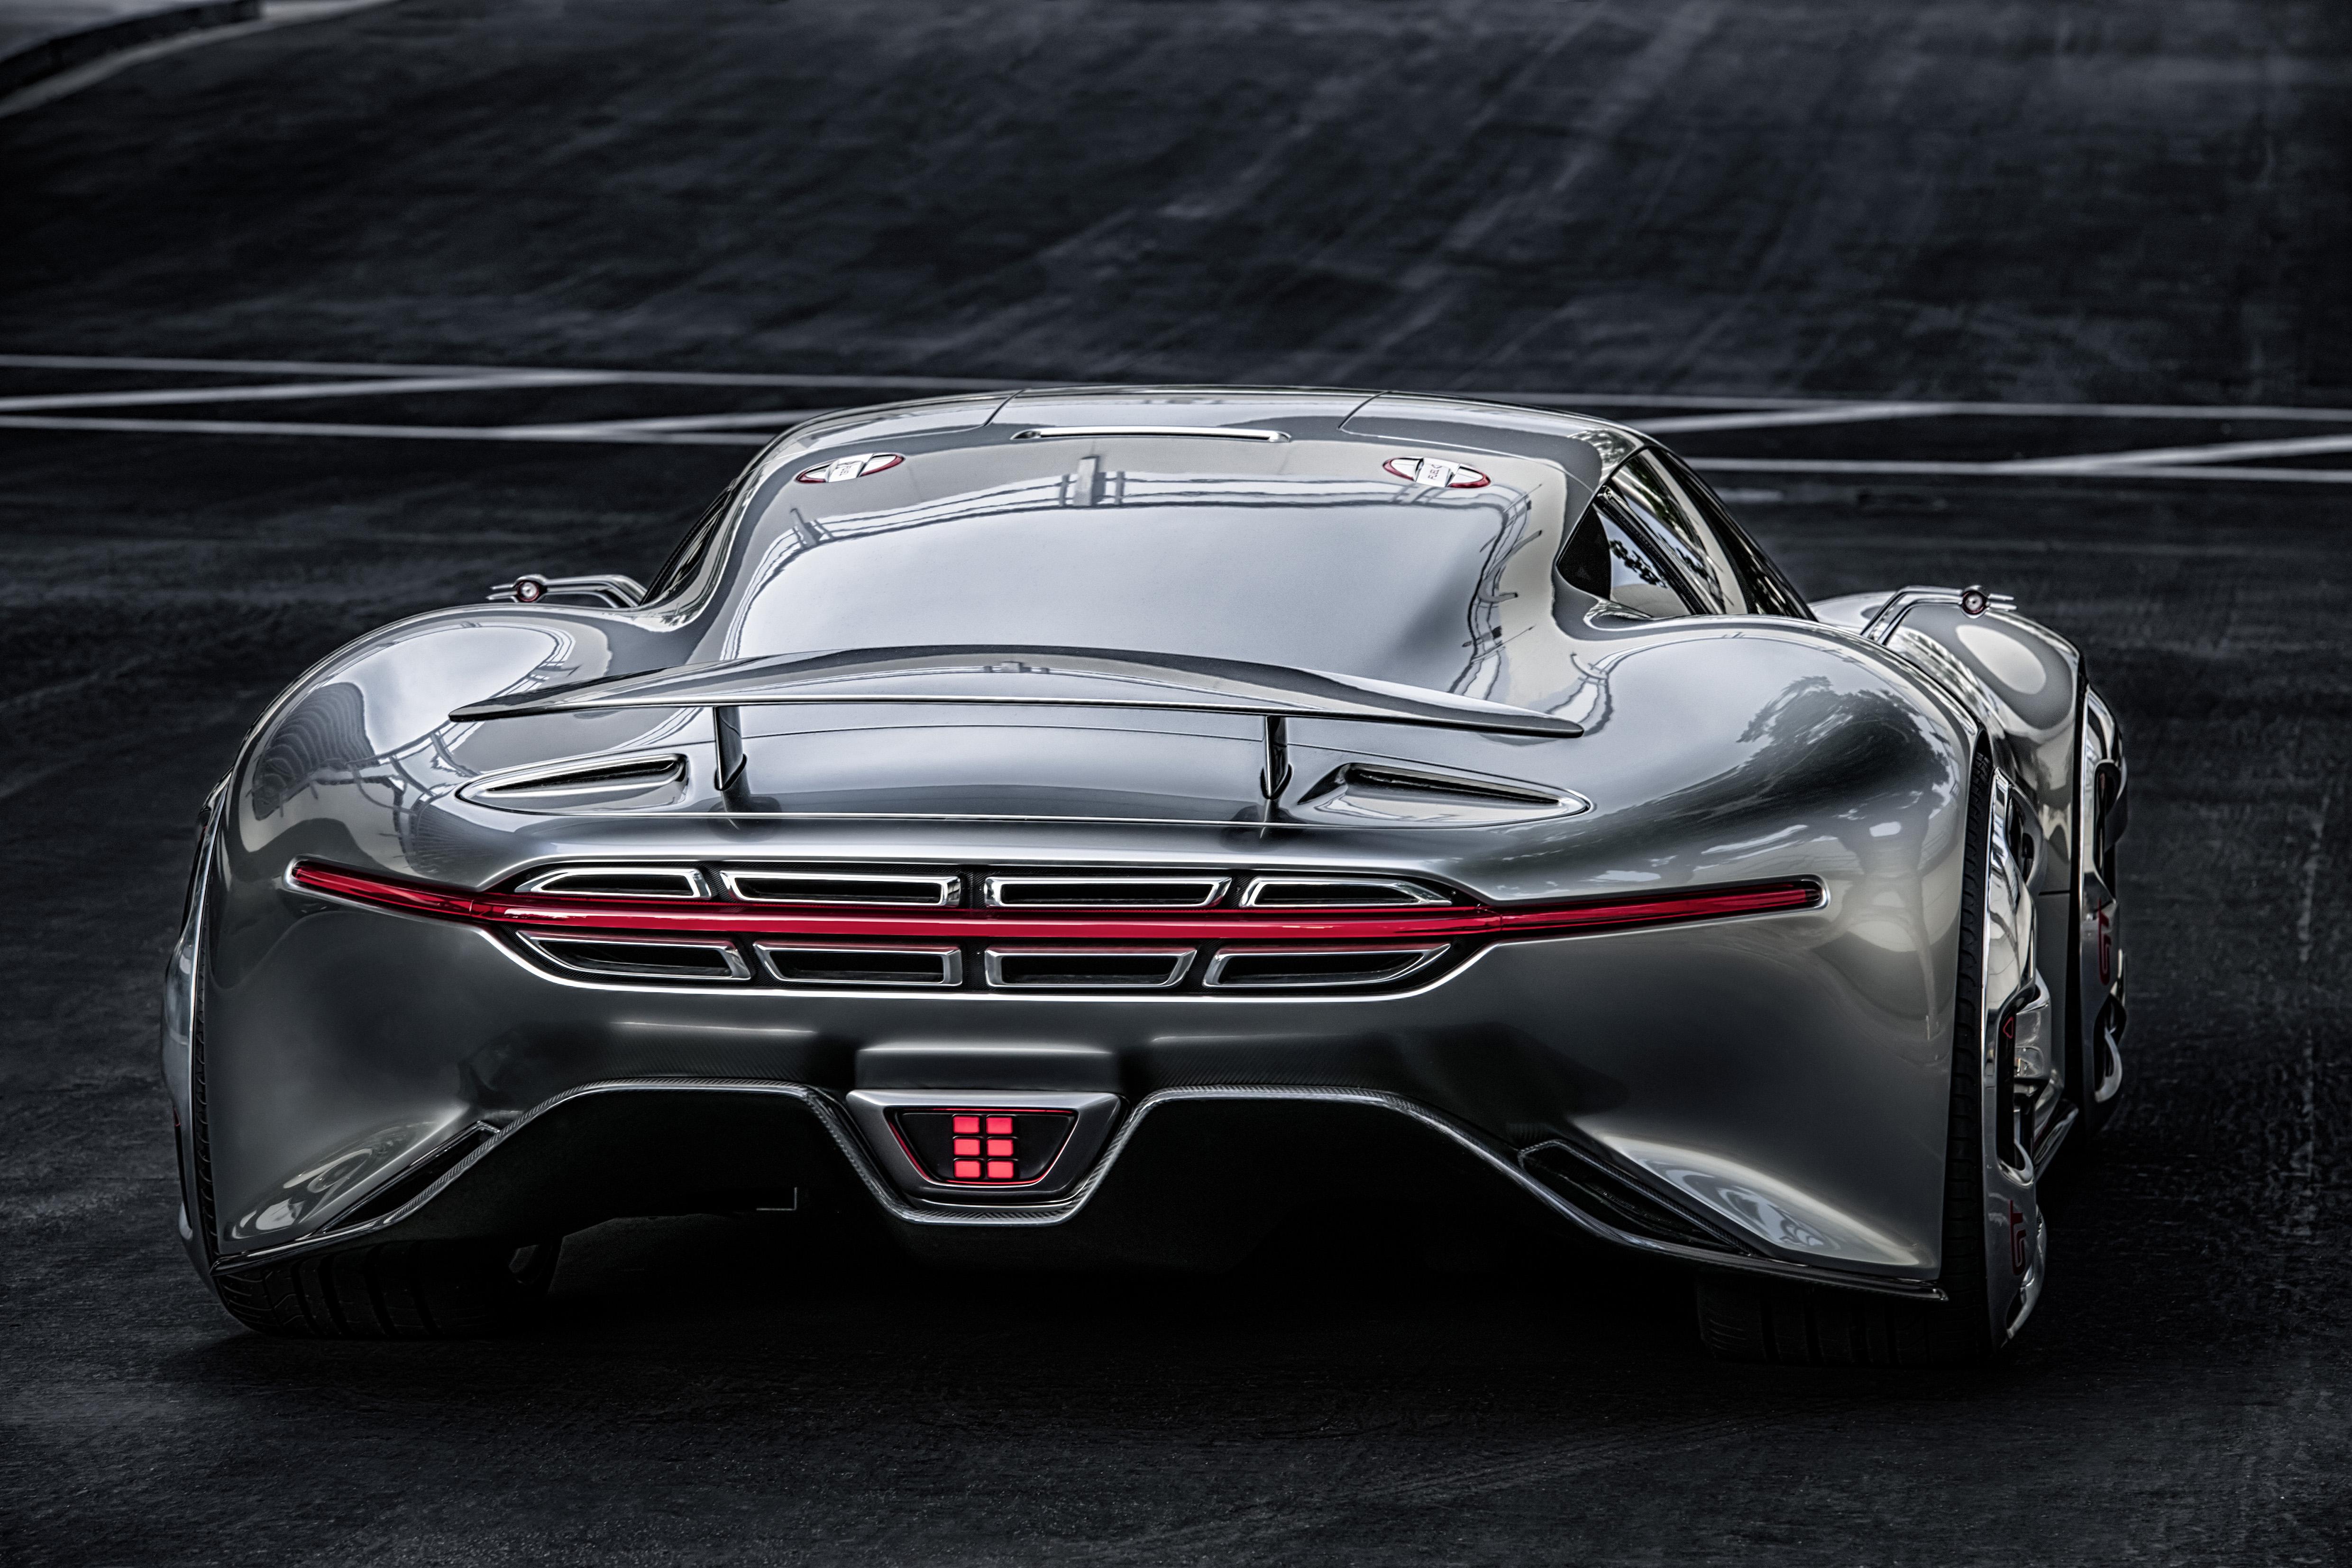 Visionärer Supersportwagen – Mercedes-Benz AMG Vision Gran Turismo